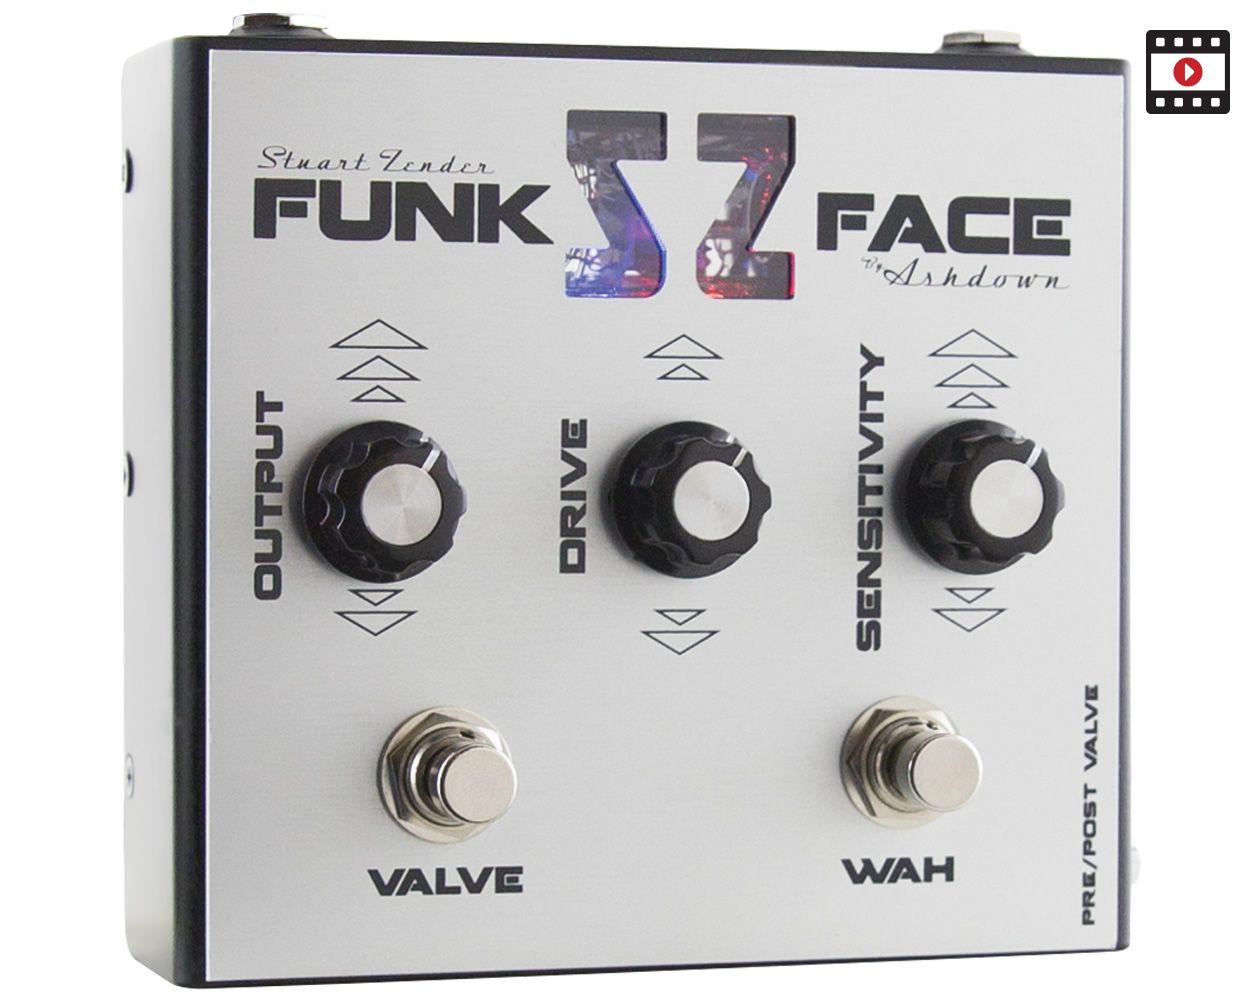 Ashdown SZ Funk Face Review